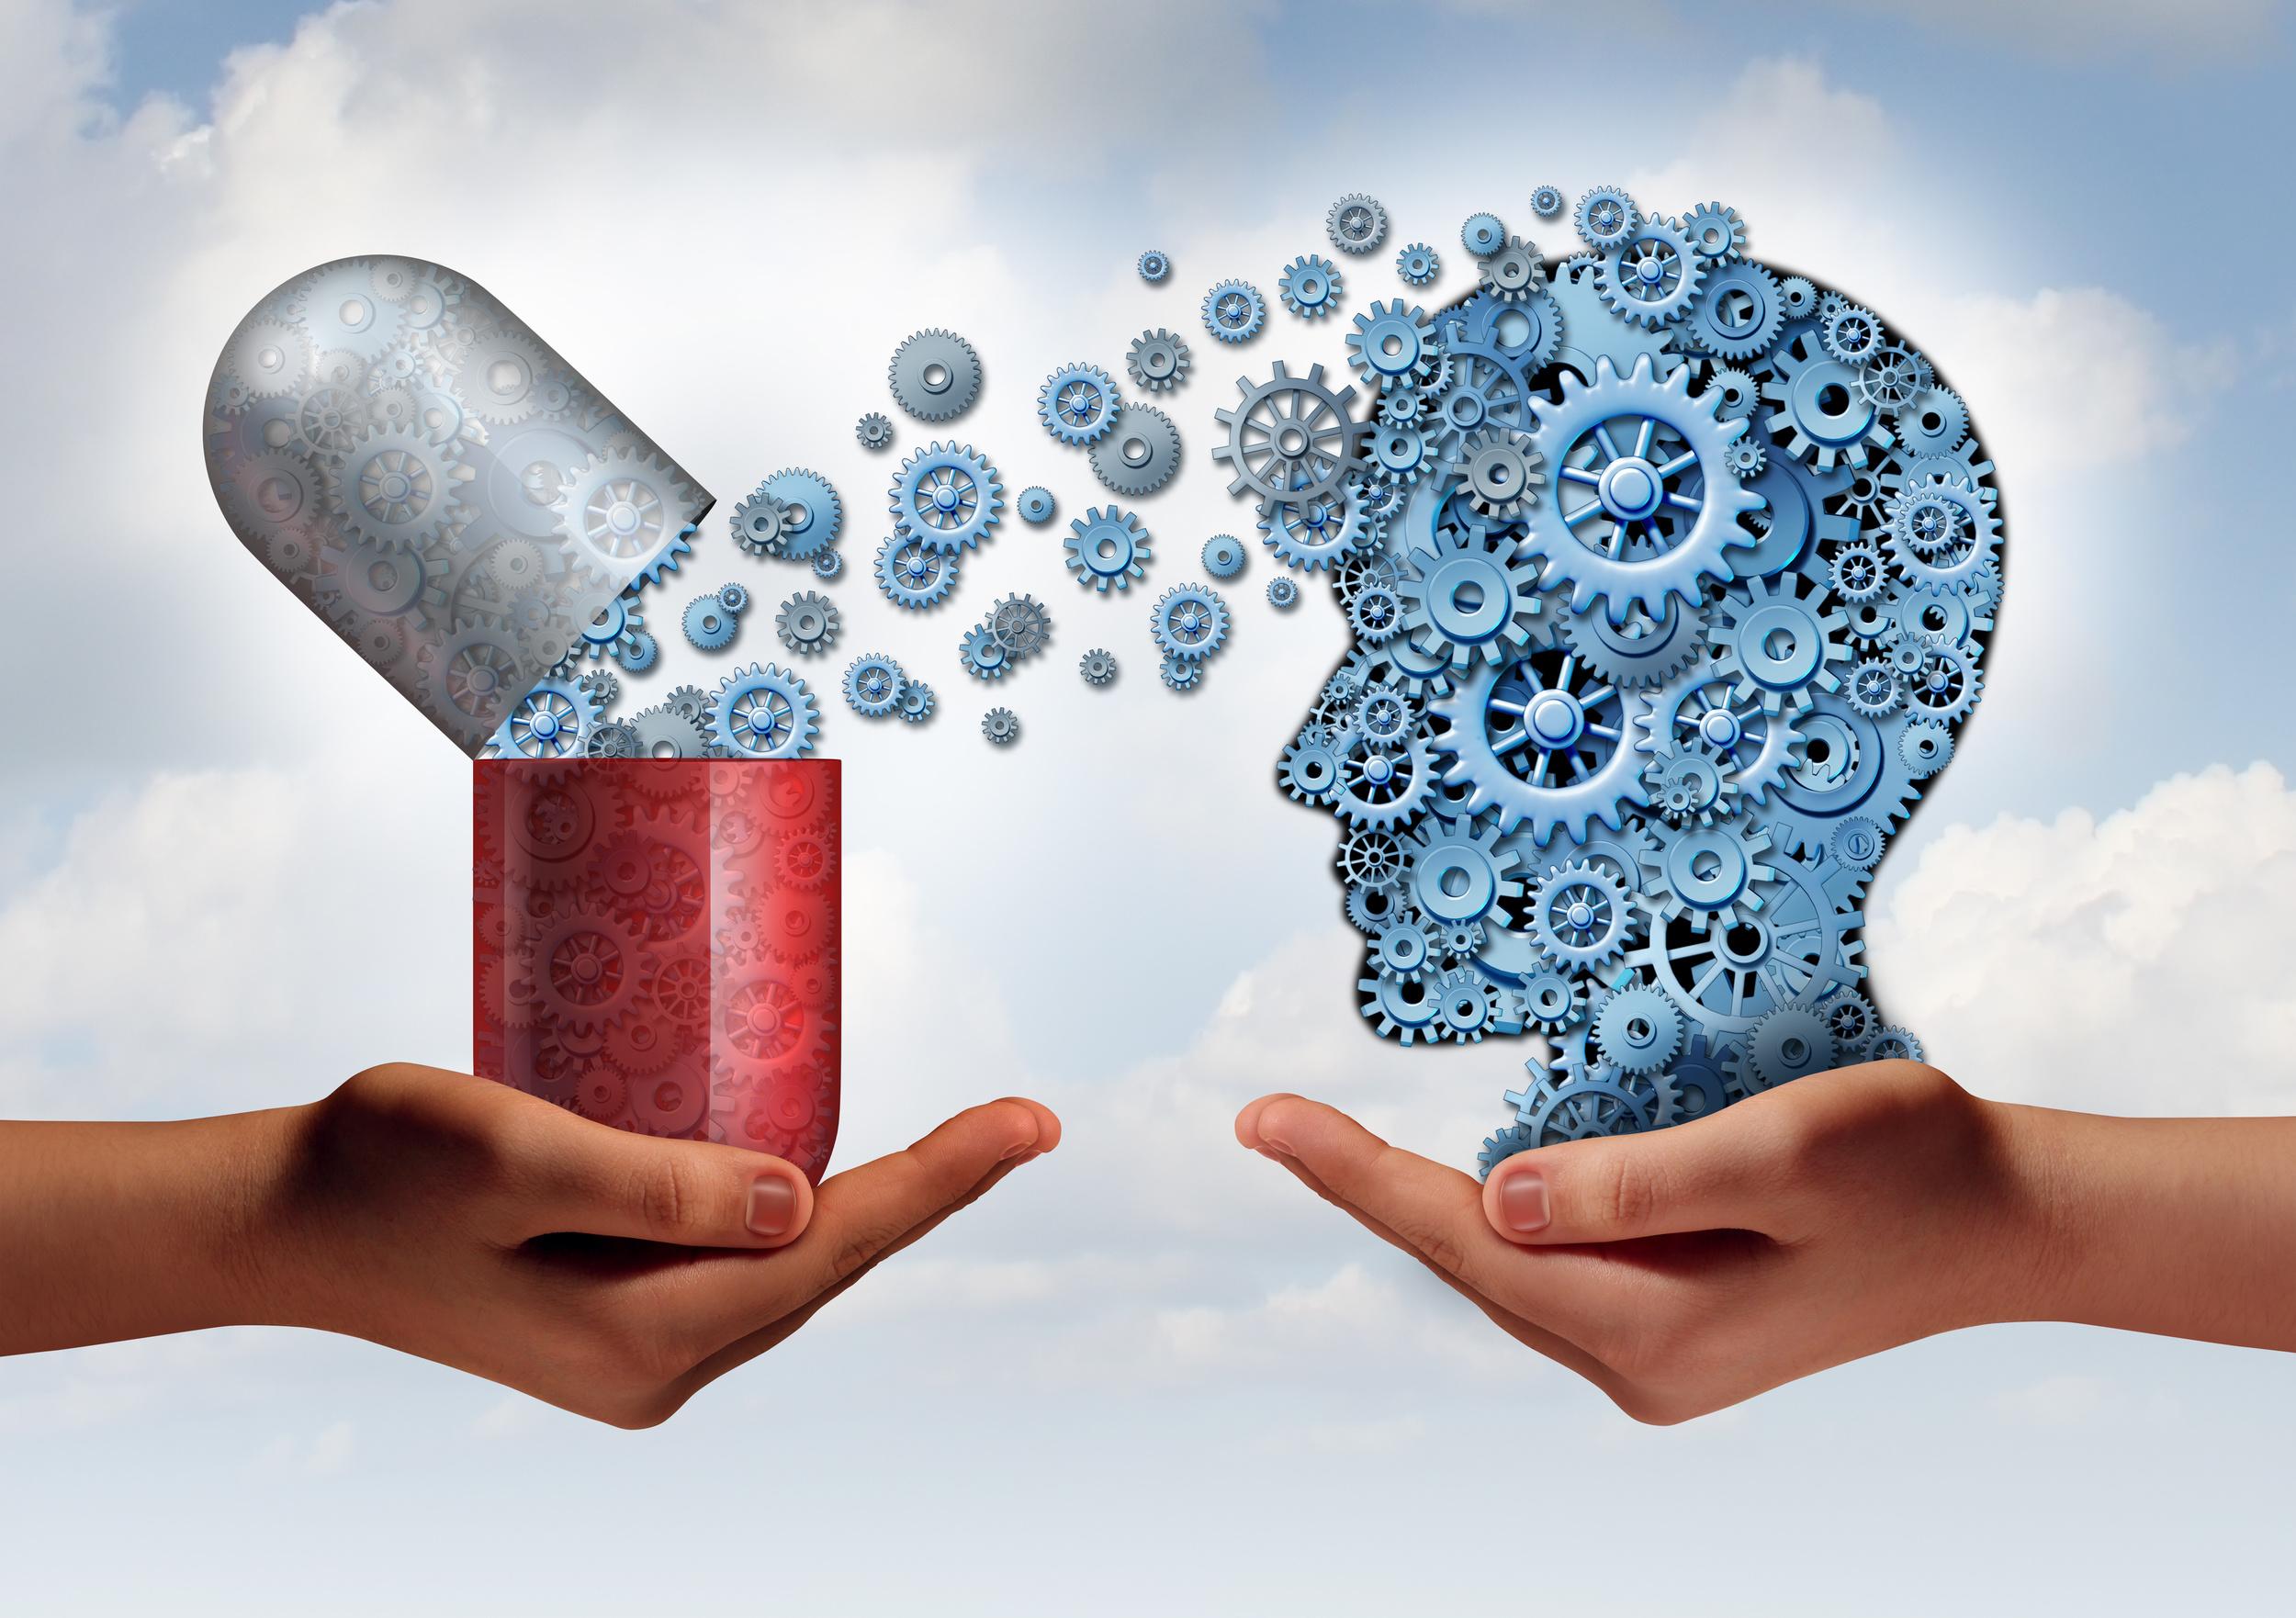 Rehacom software supports cognitive rehabilitation